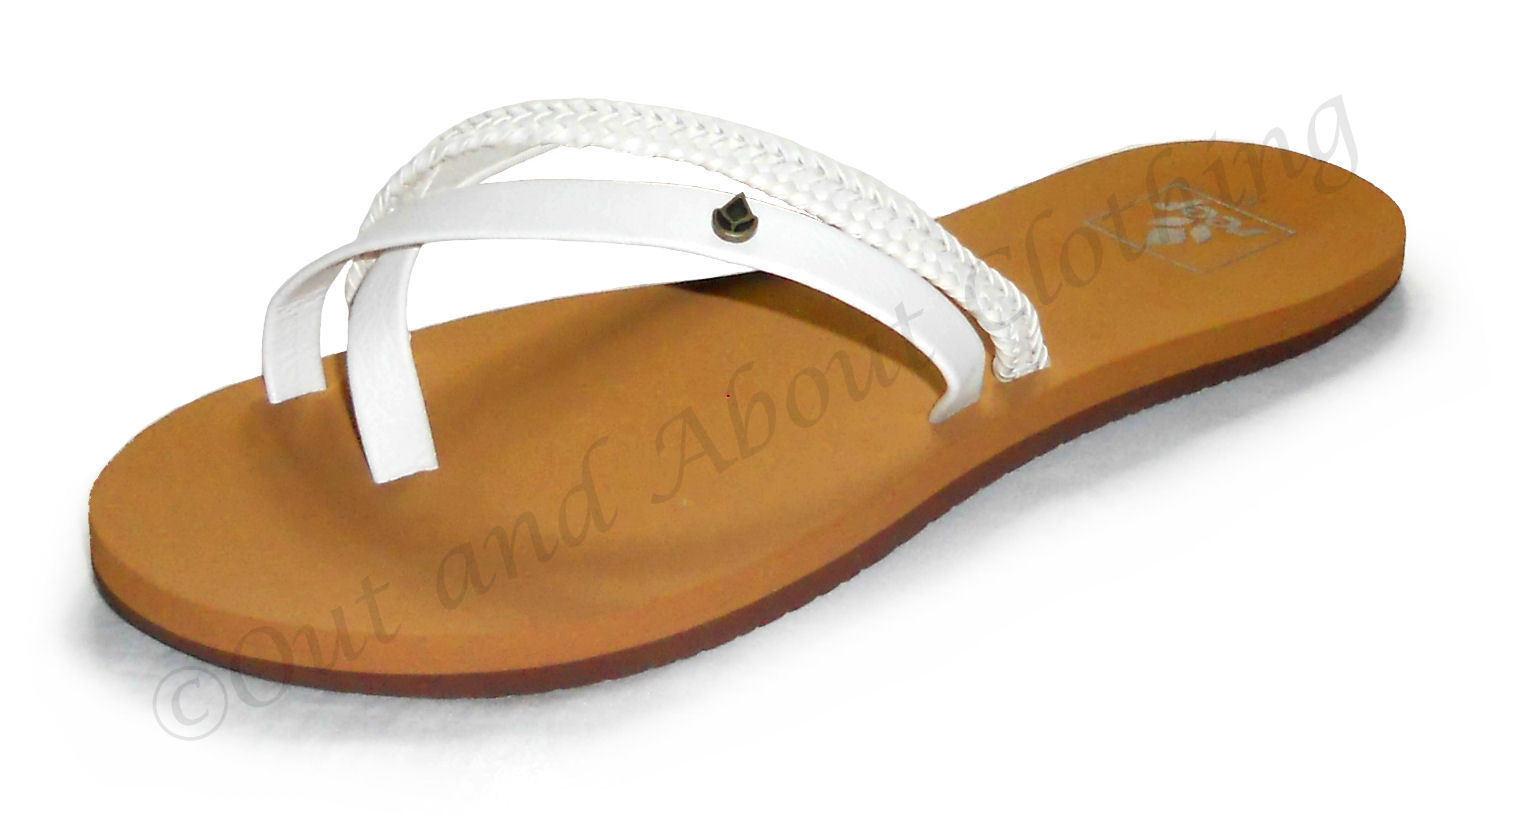 Reef Ladies 'O'Contrare LX' Flip Flops Cross Over Toe Triple Strap - White   Tan